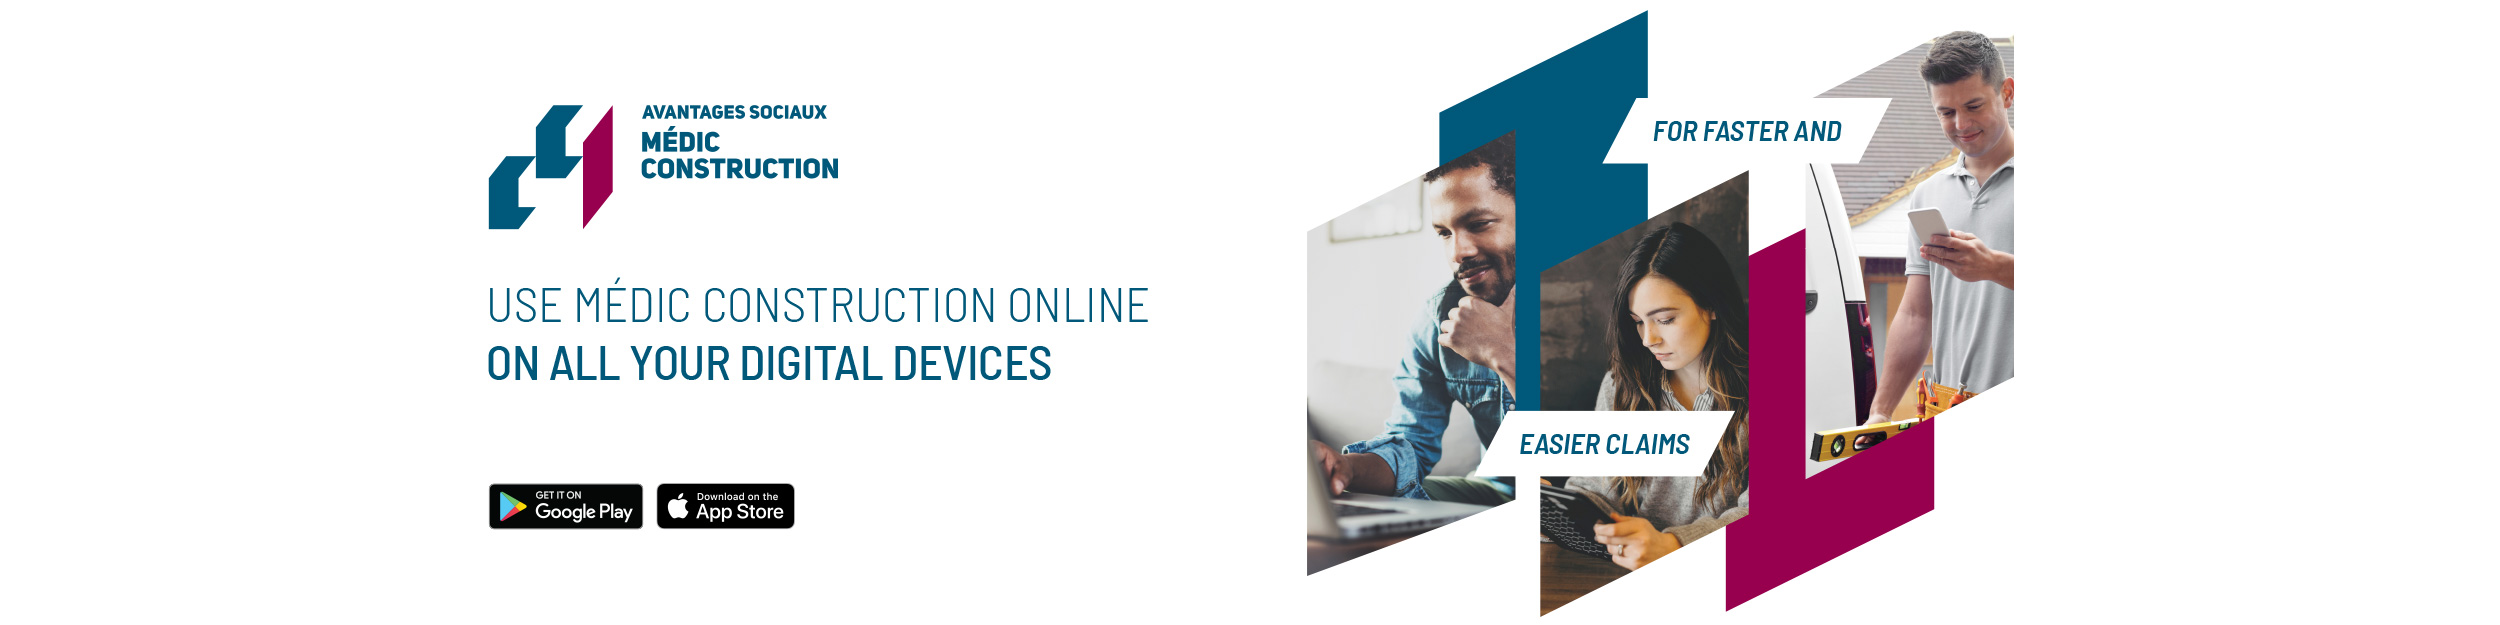 Medic Construction Online